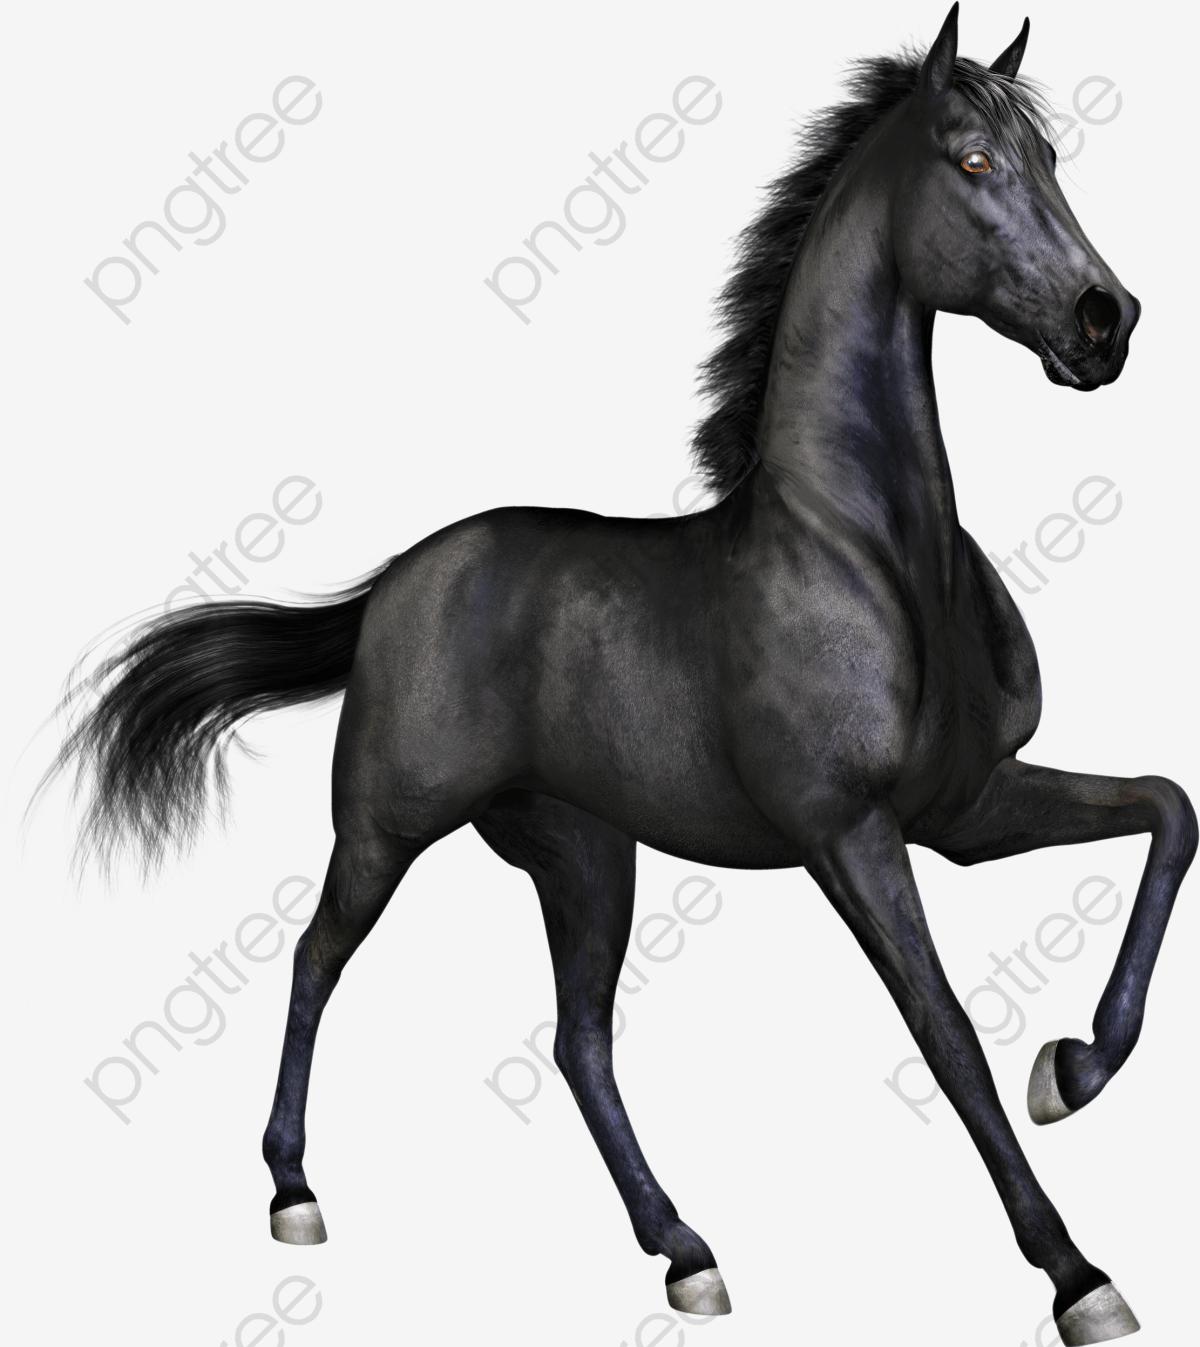 Black Stallion, Fine Horse, Black, Horse PNG Transparent Image and.